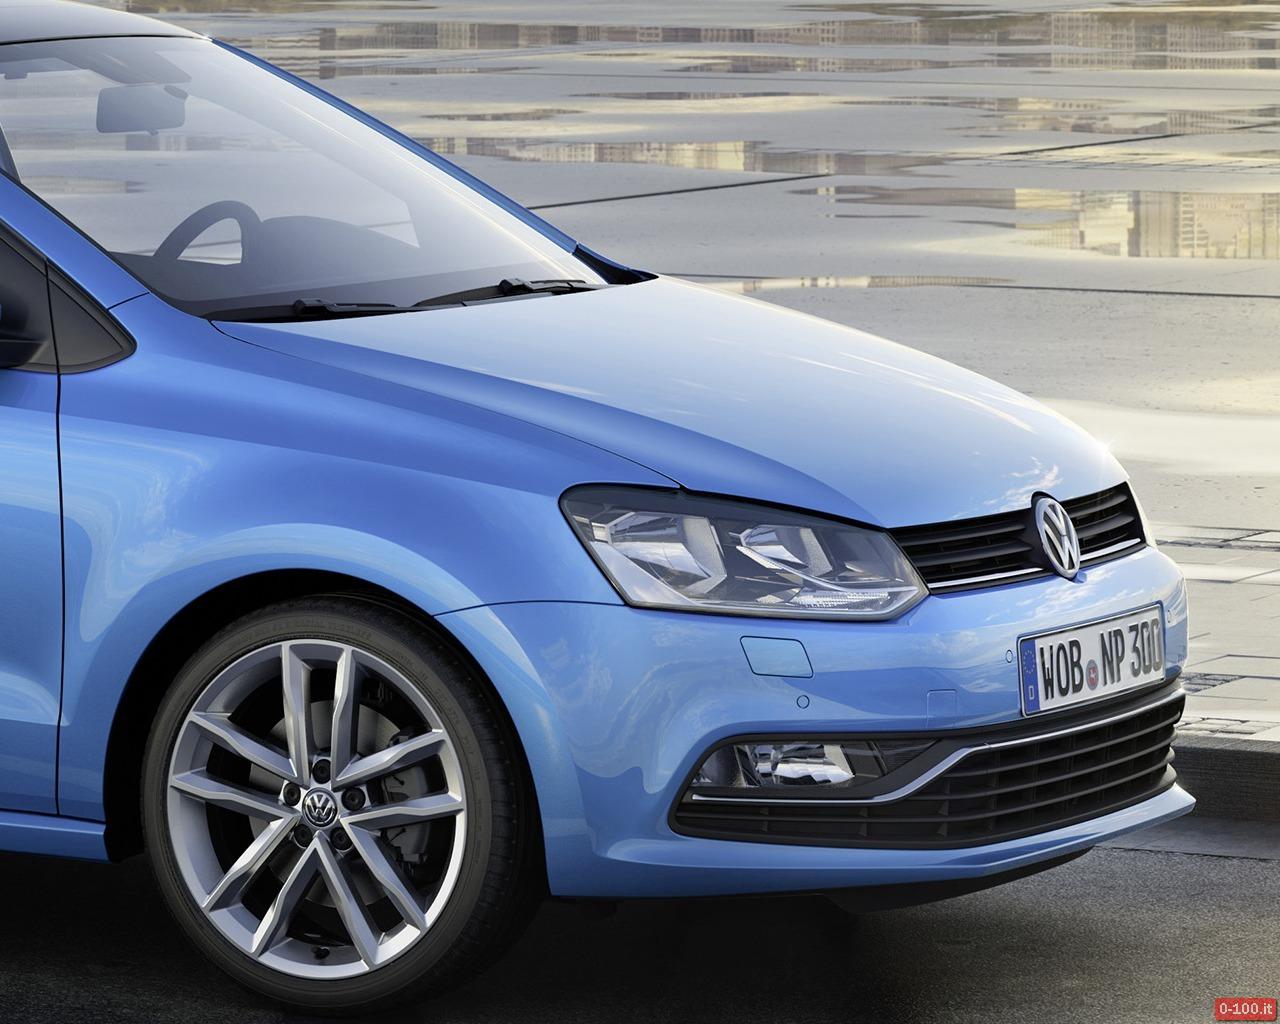 volkswagen-polo-gti-price-prezzo-2014-0-100_14